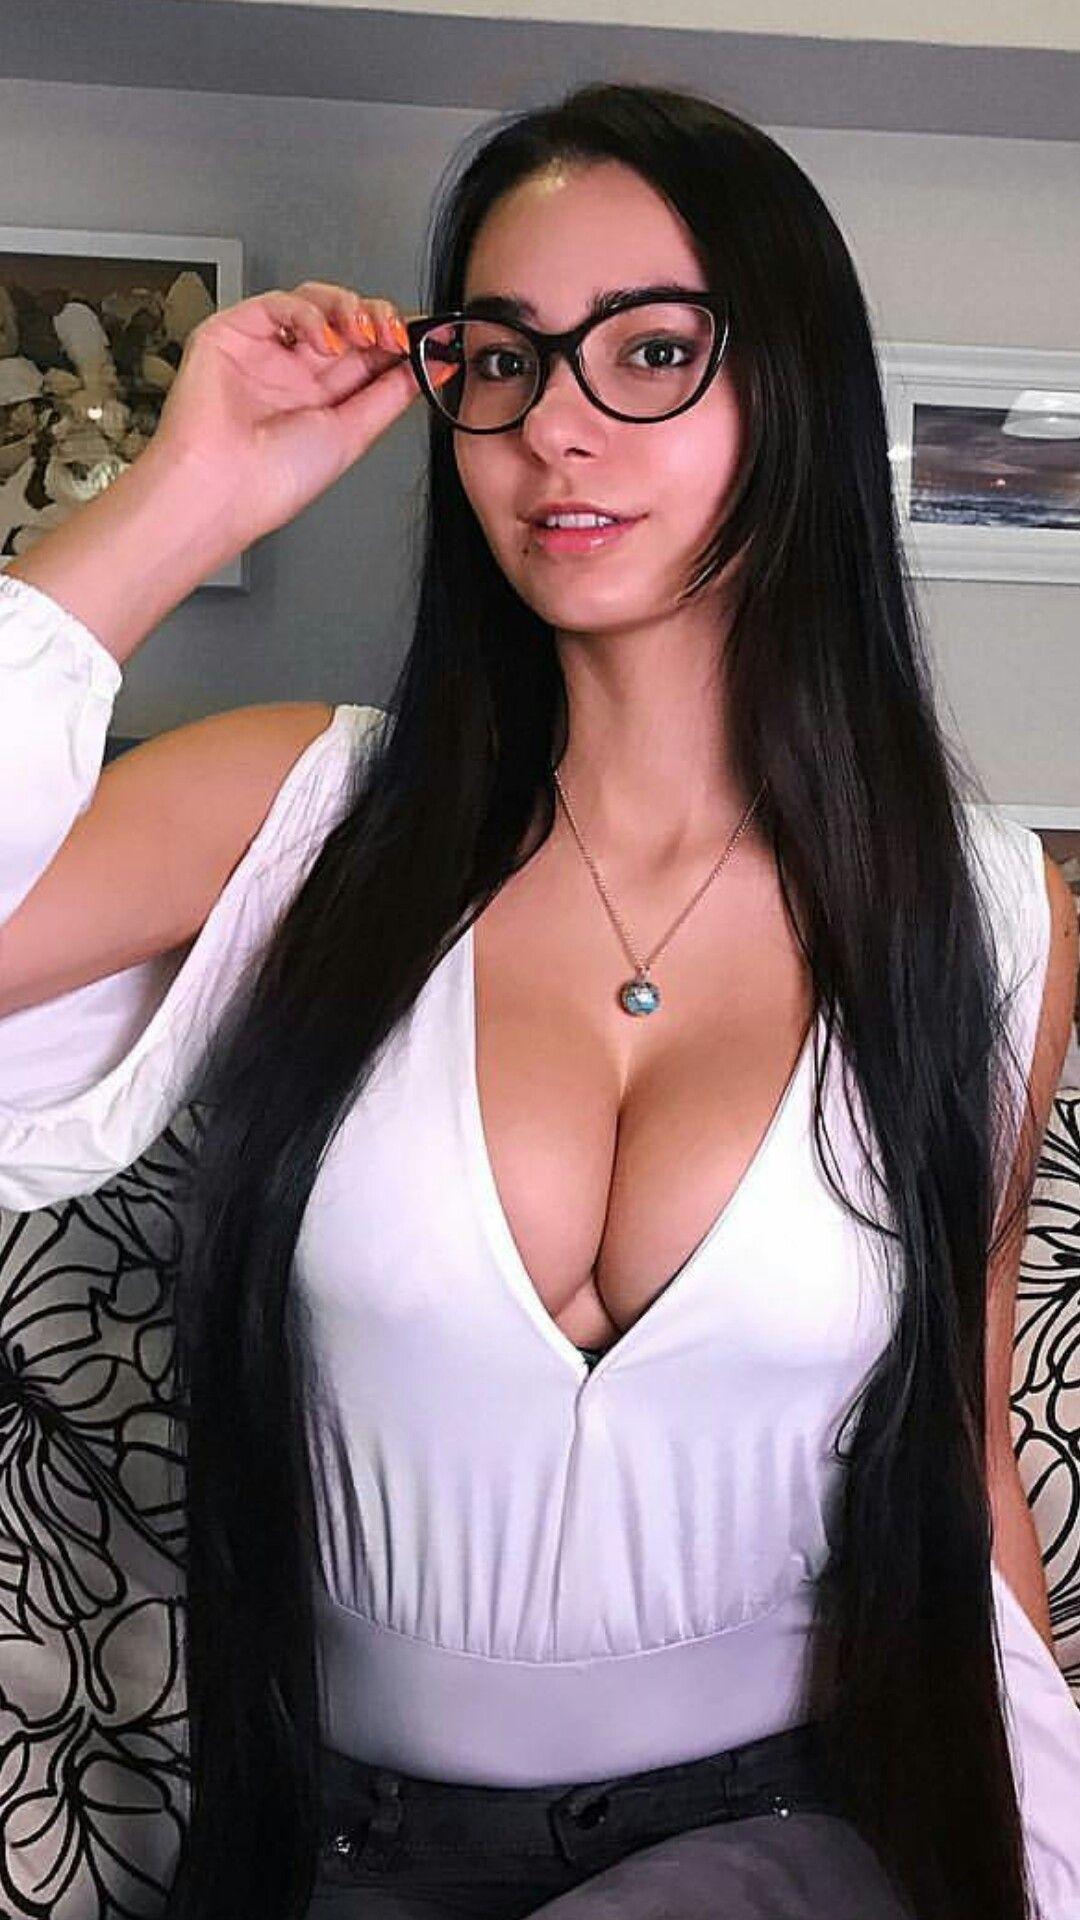 Girl russian porn cute